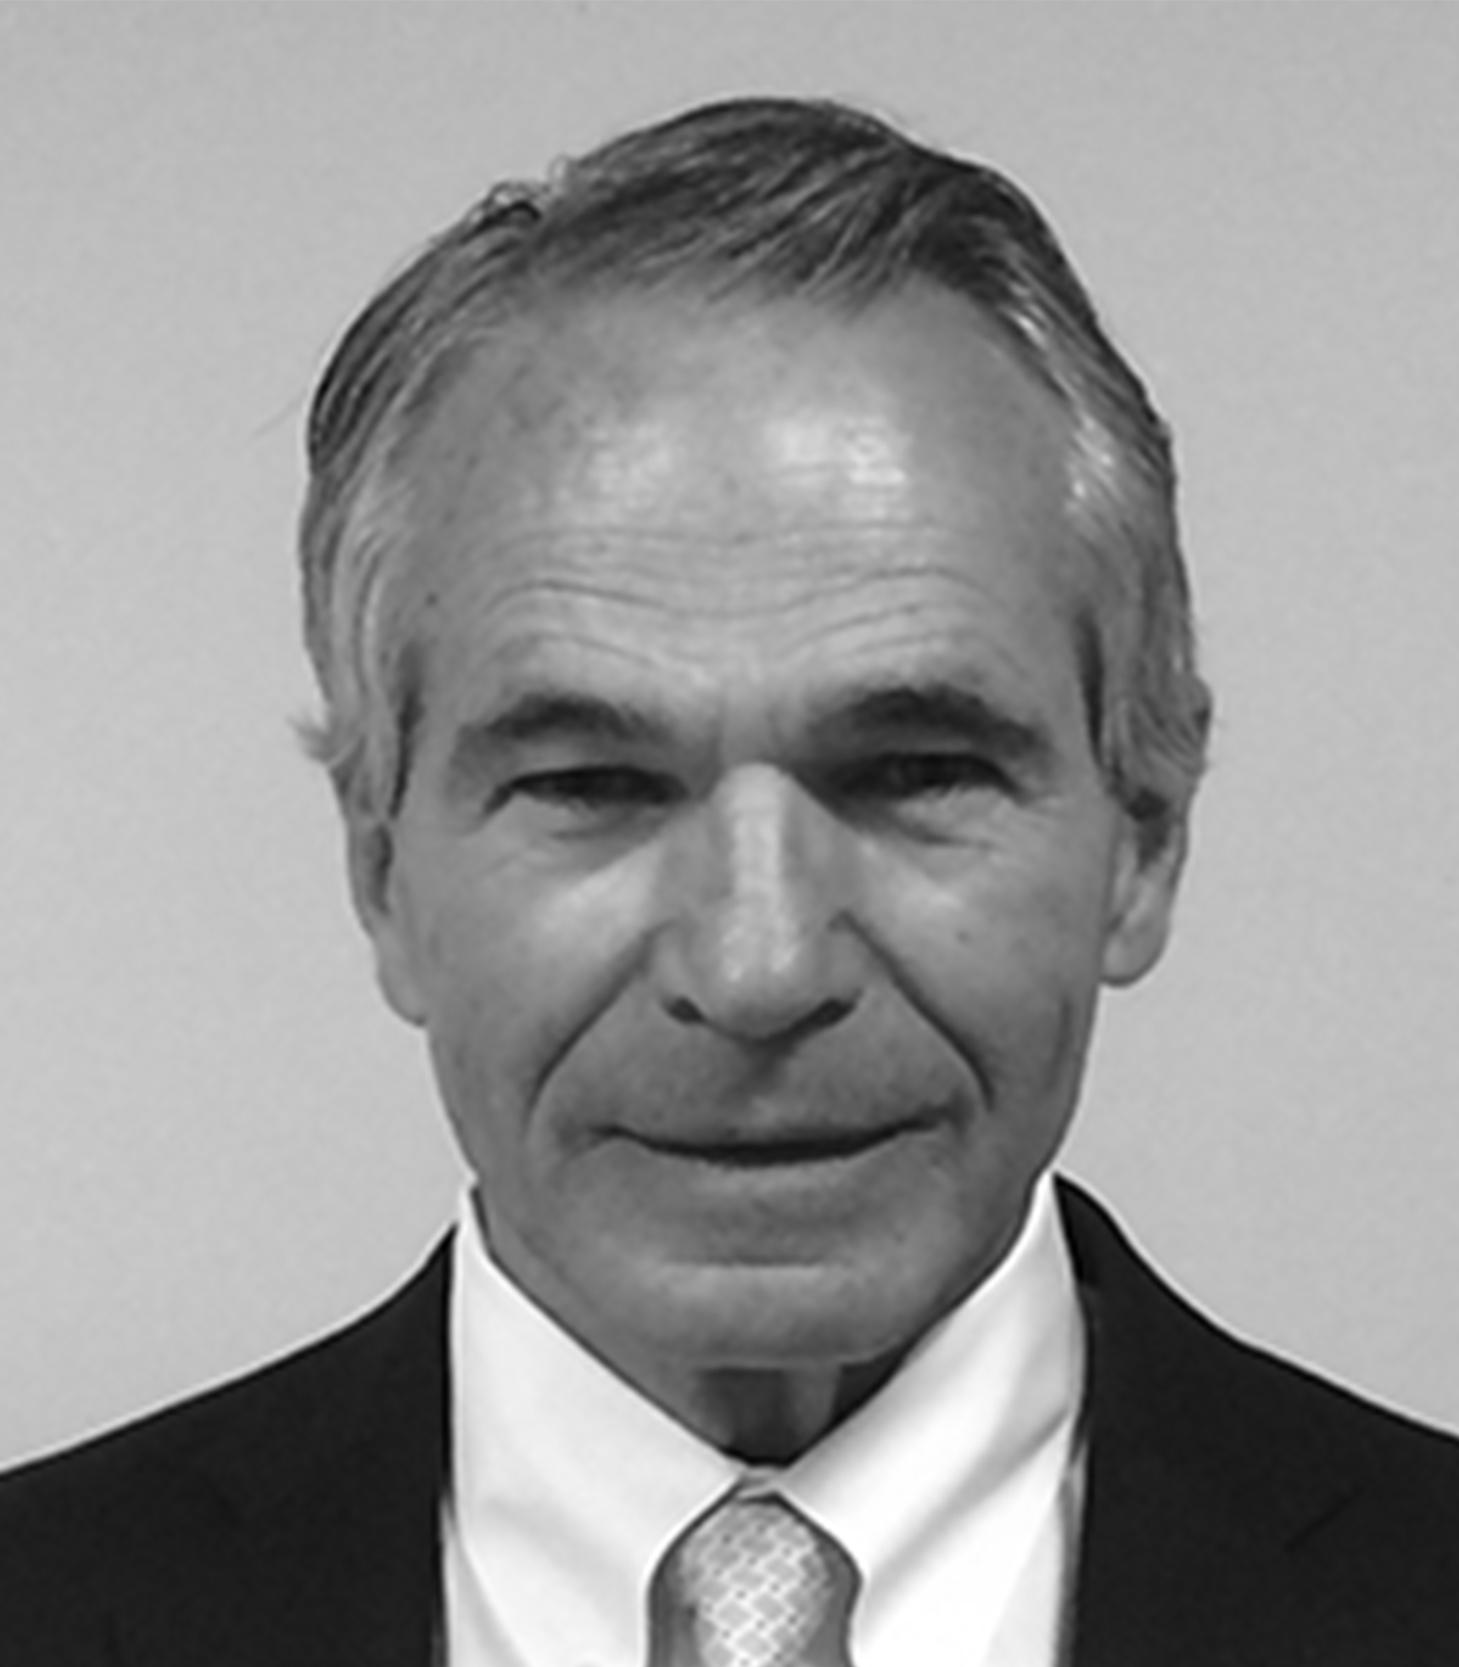 Walter J. Plumb